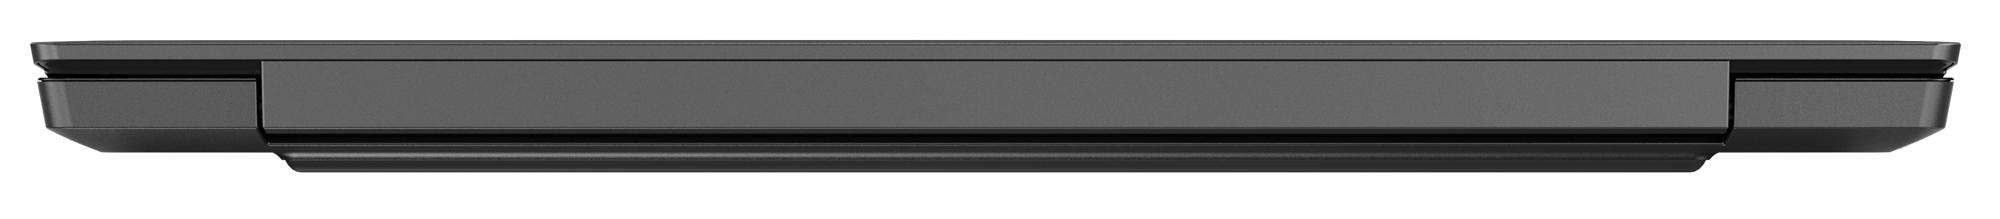 Фото  Ноутбук Lenovo V330-14 Grey (81B000HKRA)